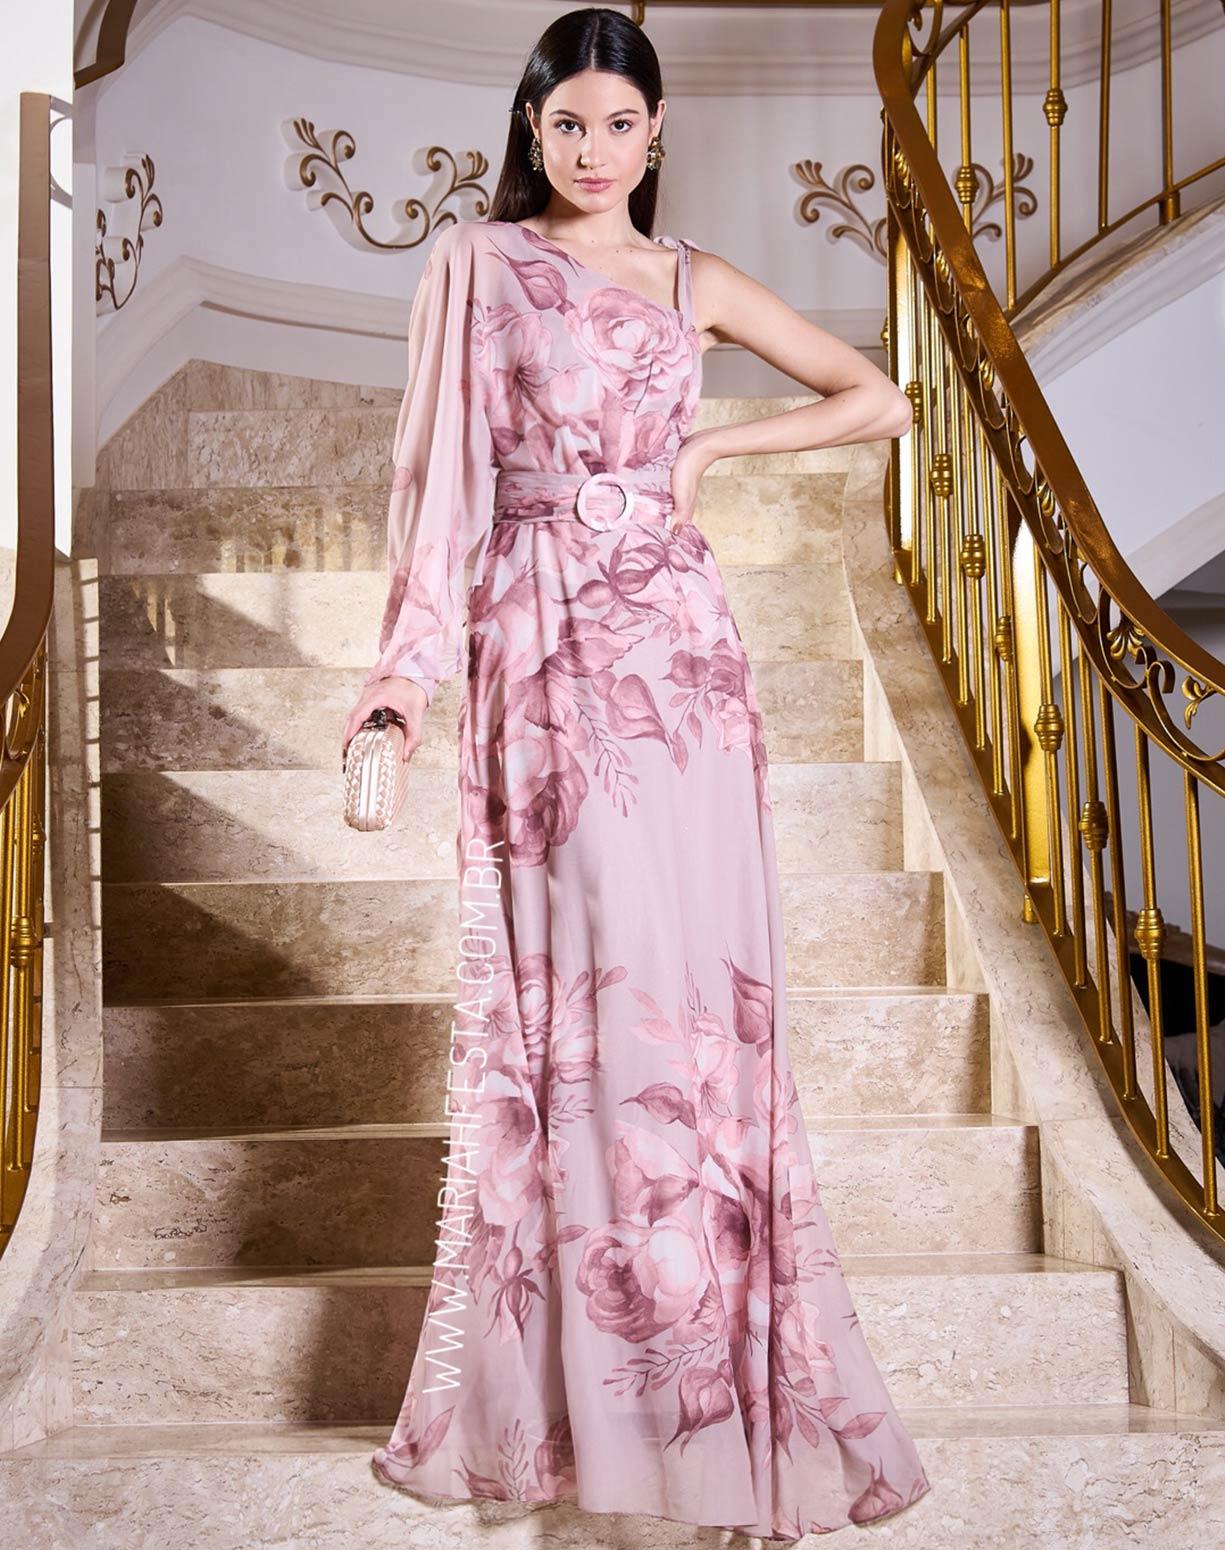 Vestido Rosê de Um Ombro Só e Alça de Amarrar